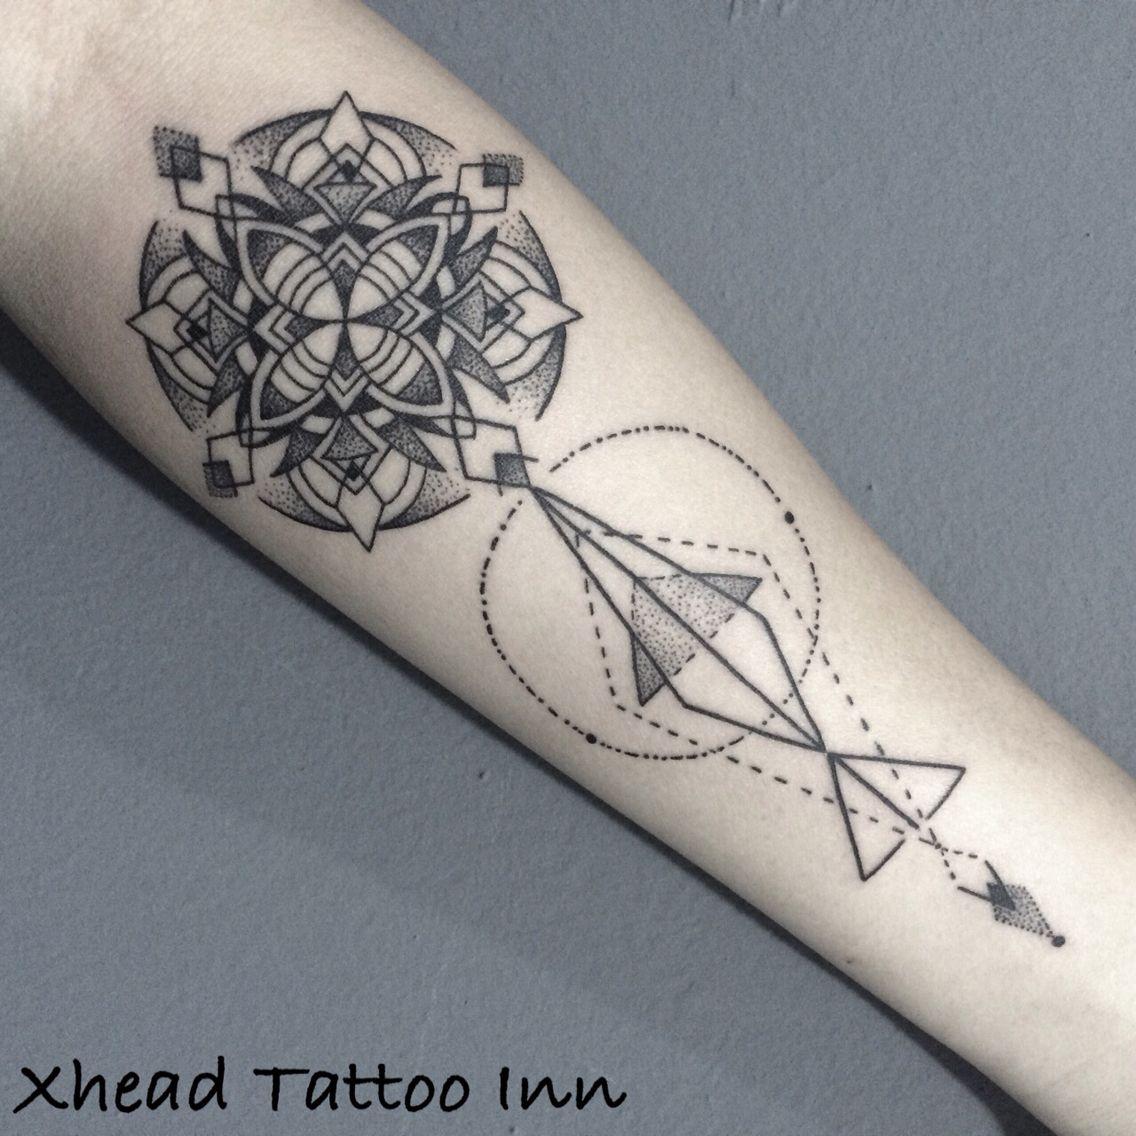 Nepalese Tattoo Inn Home: Geometric Original Design Dots And Lines Xhead Tattoo